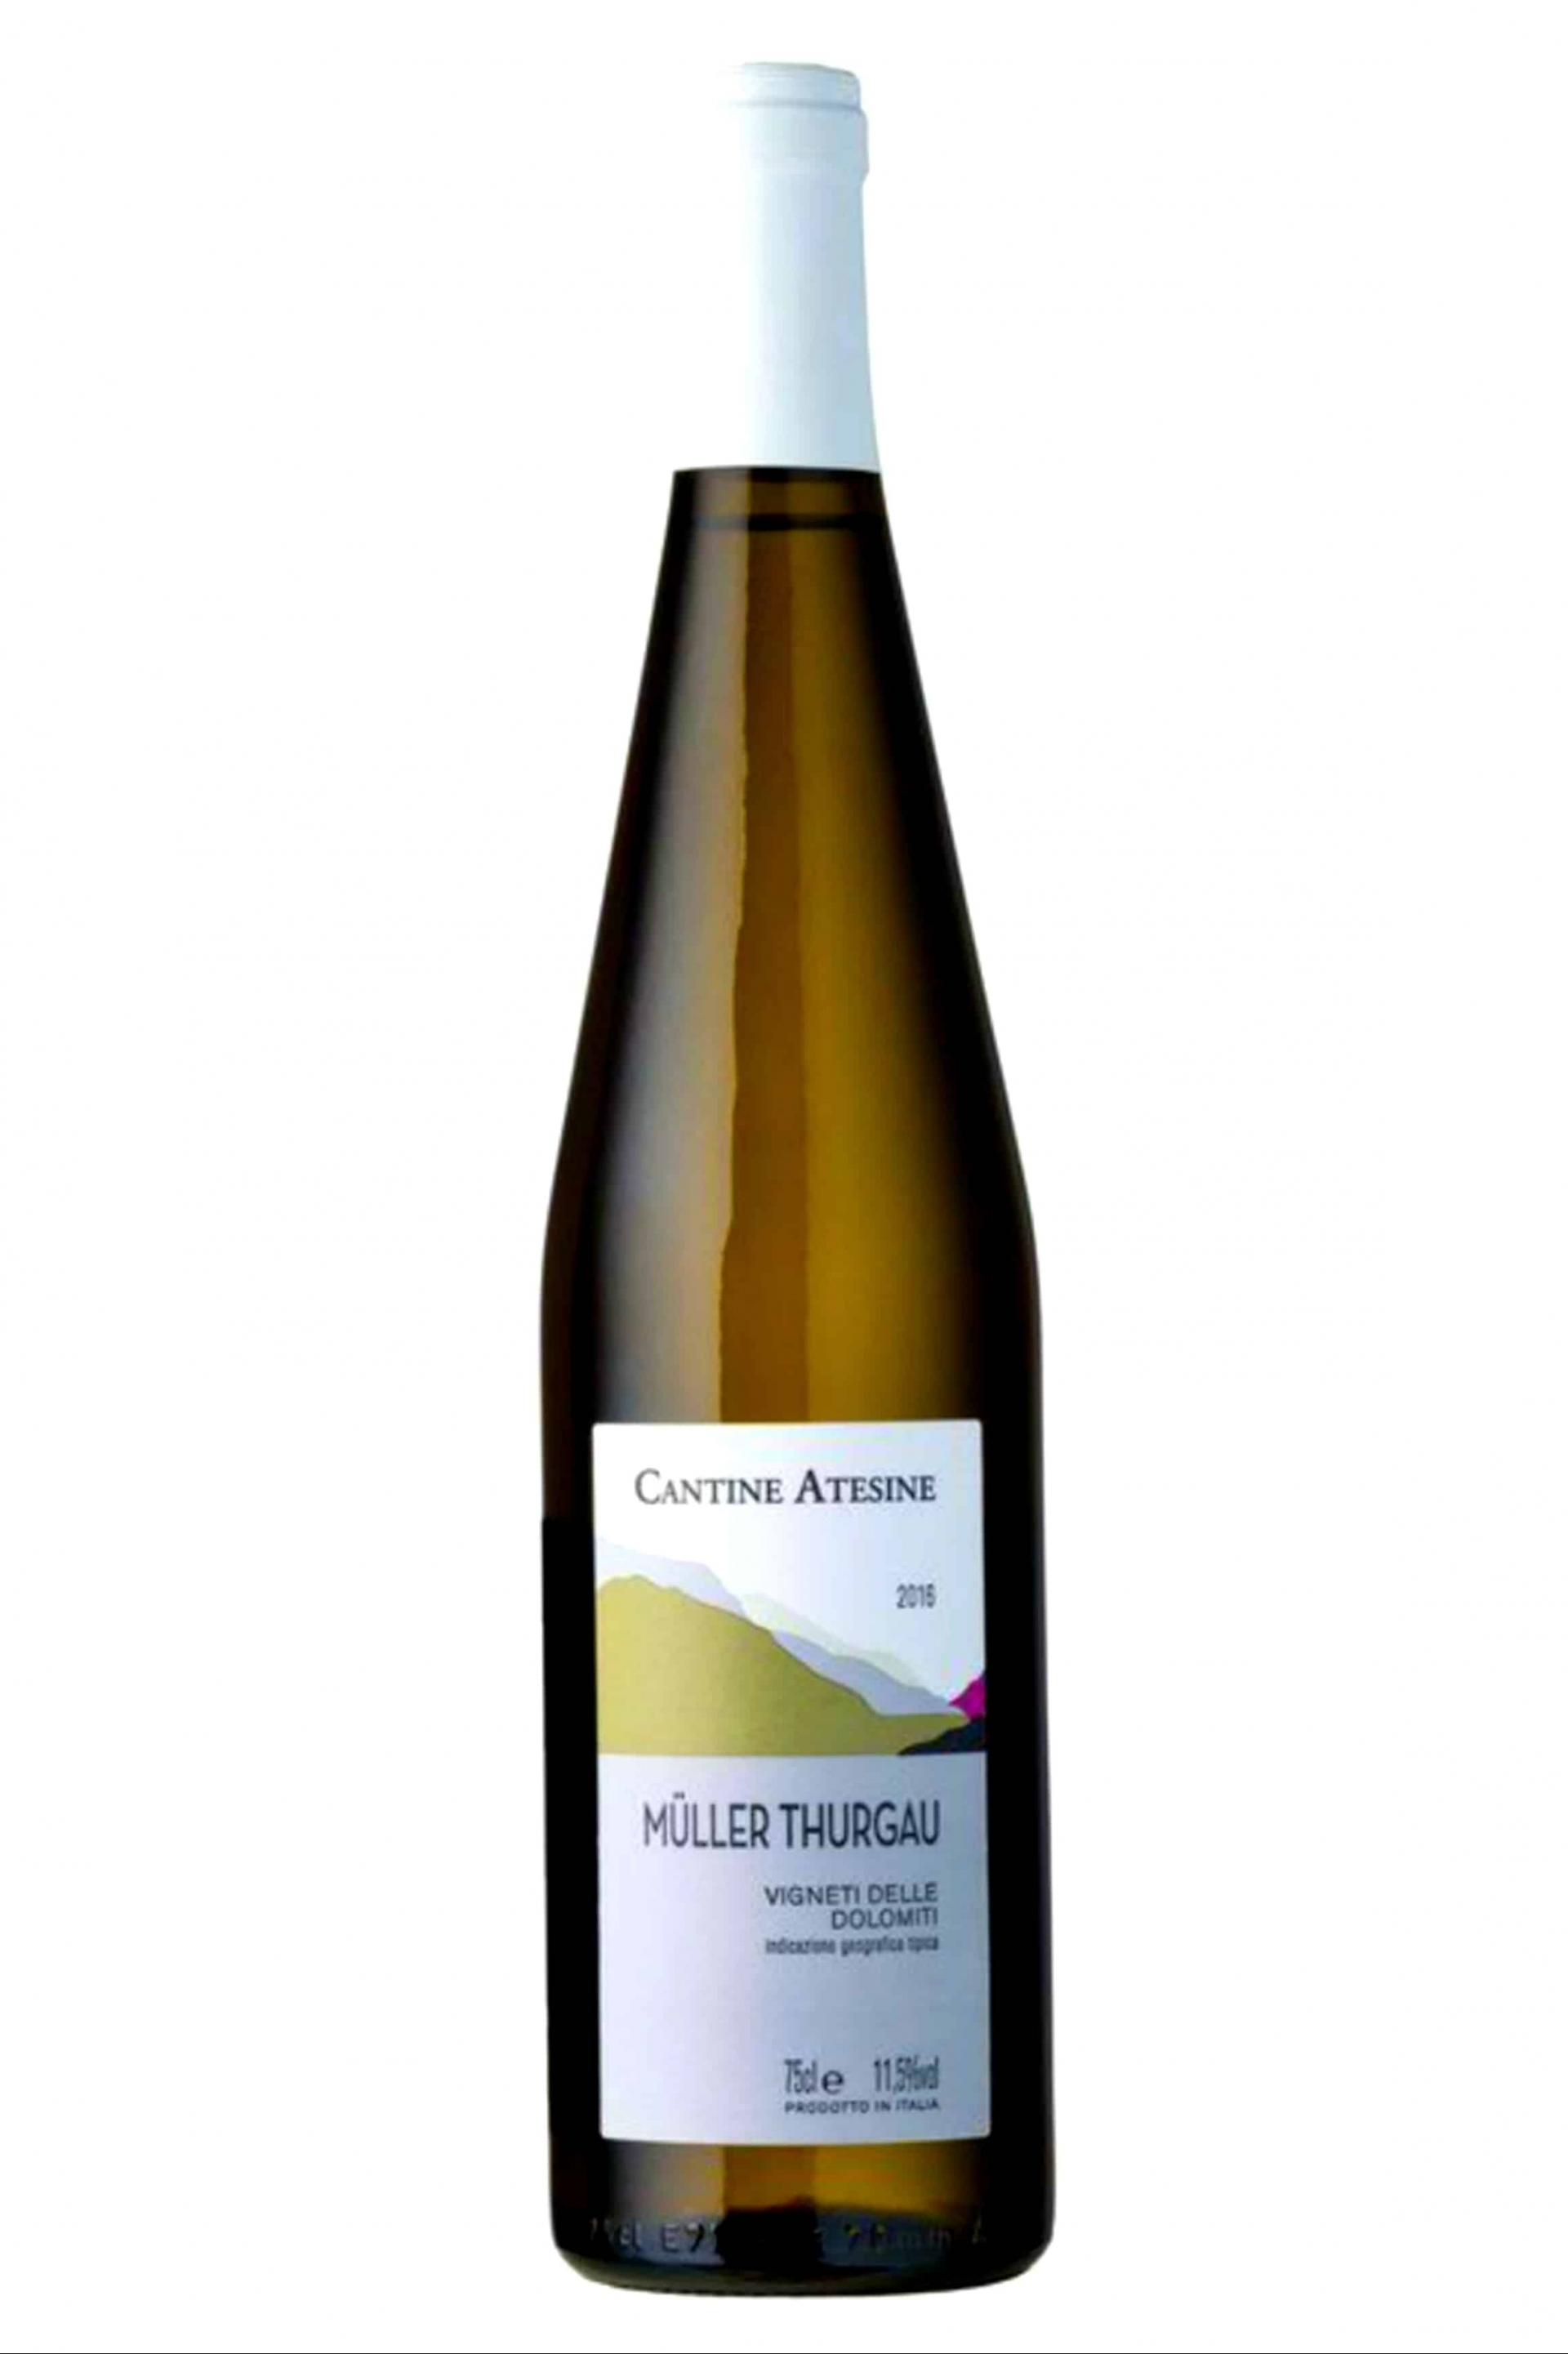 Cantine Atesine Muller Thurgau 750ml